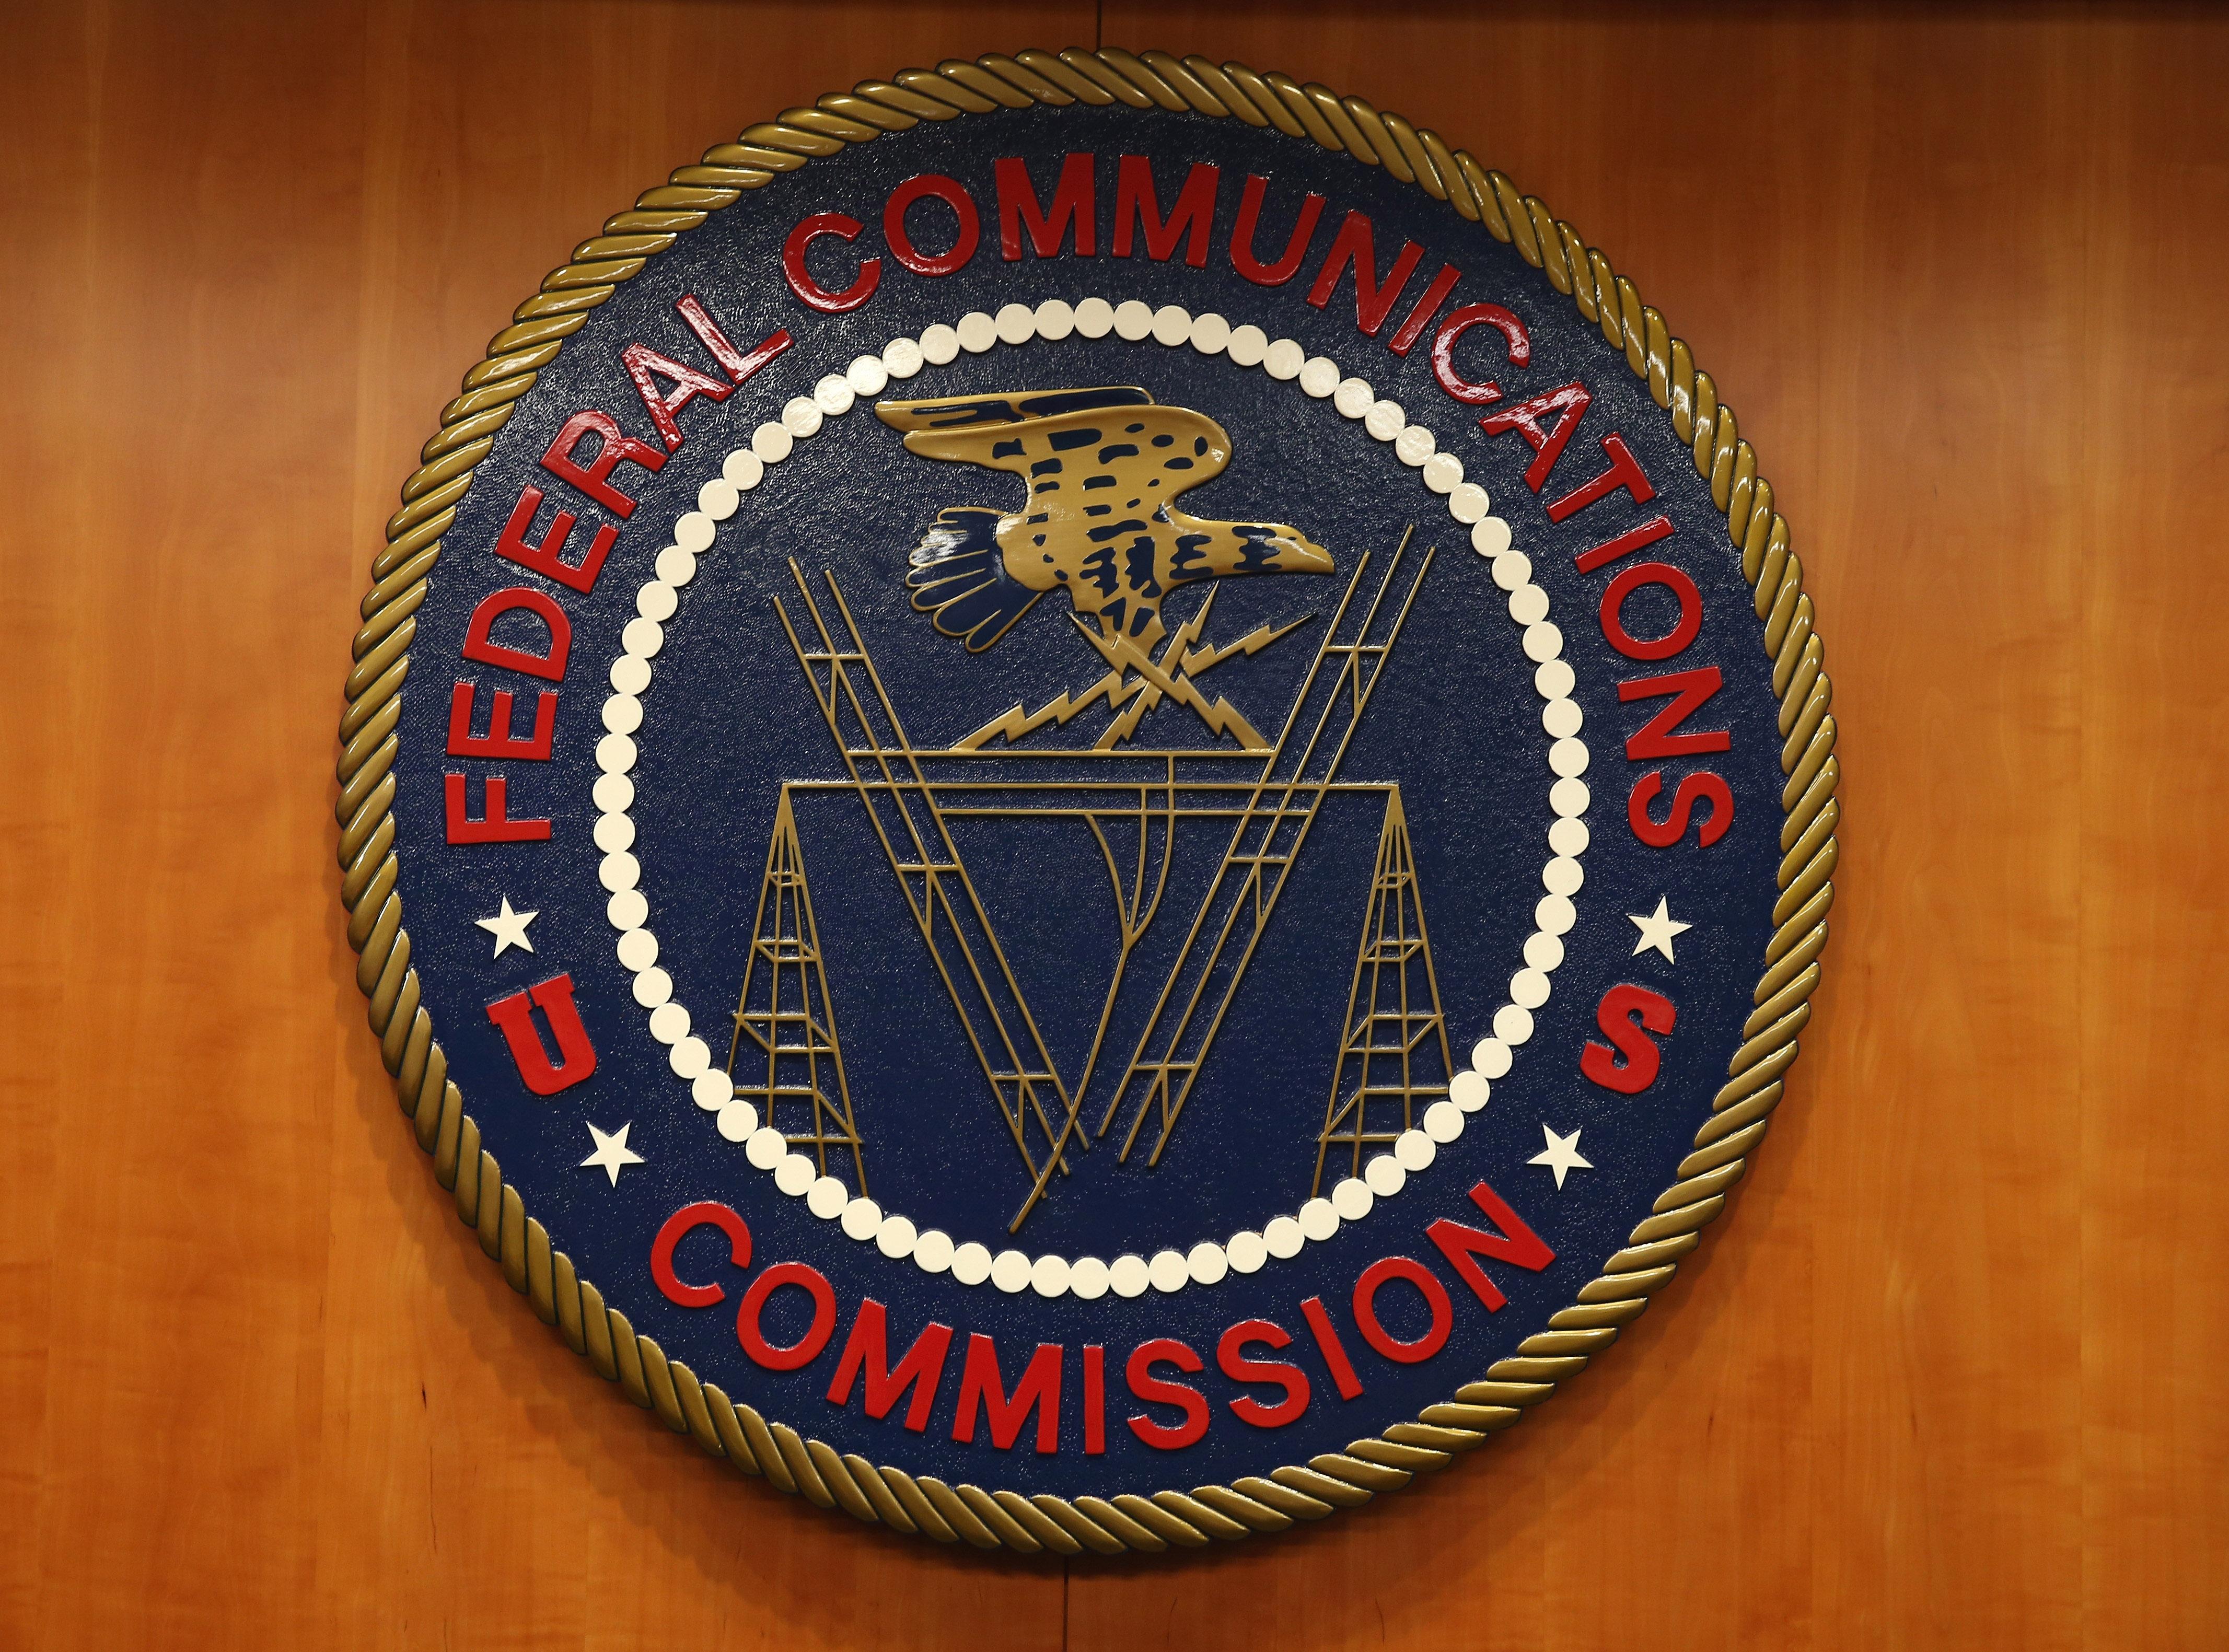 Republicans want the FCC to shut down potential set-top box overhaul